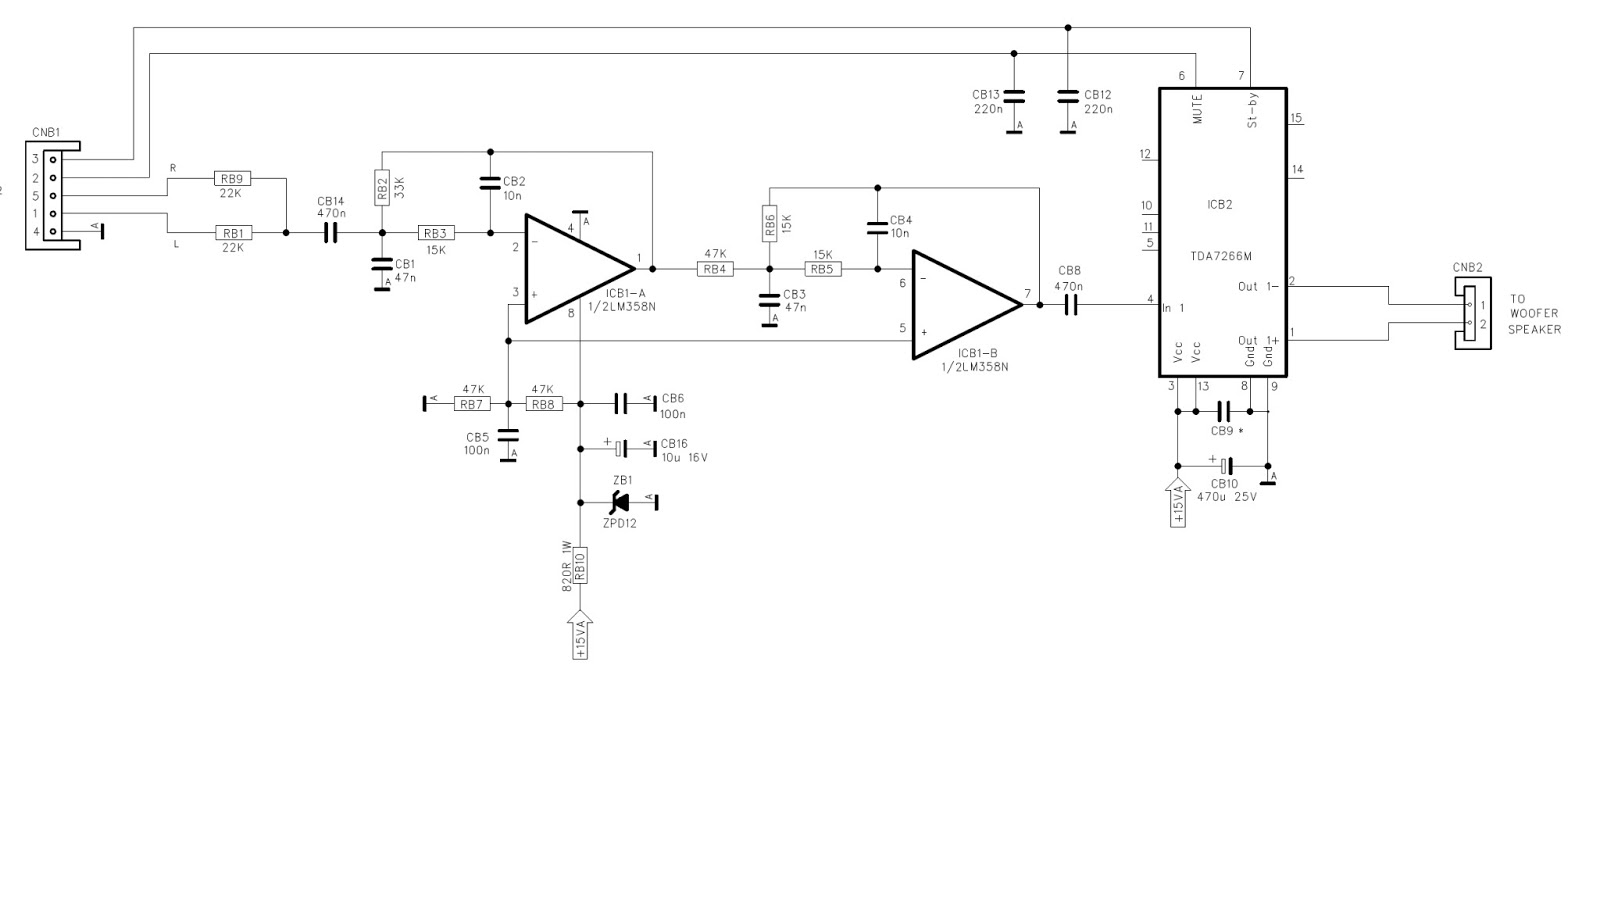 lm358n amplifier circuit woofer amplifier circuit diagram sub woofer circuit woofer circuit diagram electro magnet diagram [ 1600 x 919 Pixel ]